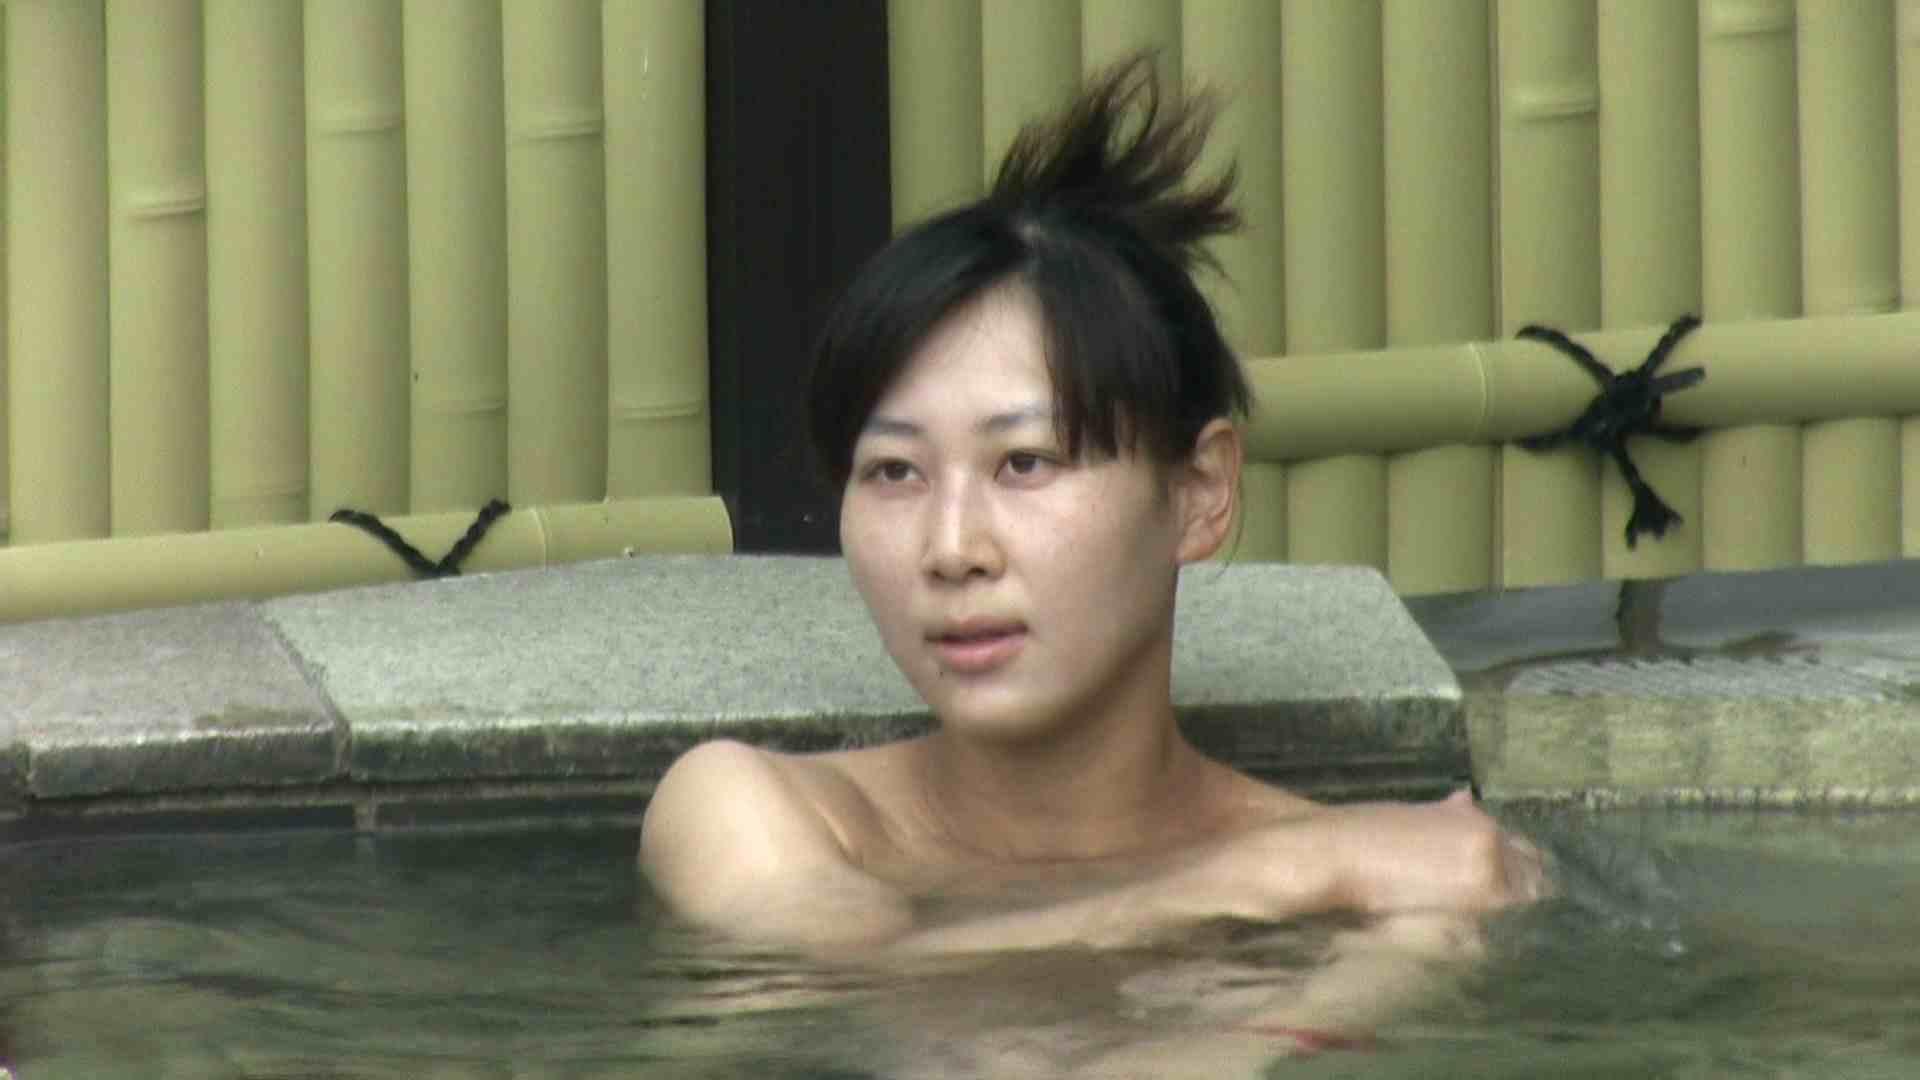 Aquaな露天風呂Vol.665 綺麗なOLたち  85枚 48